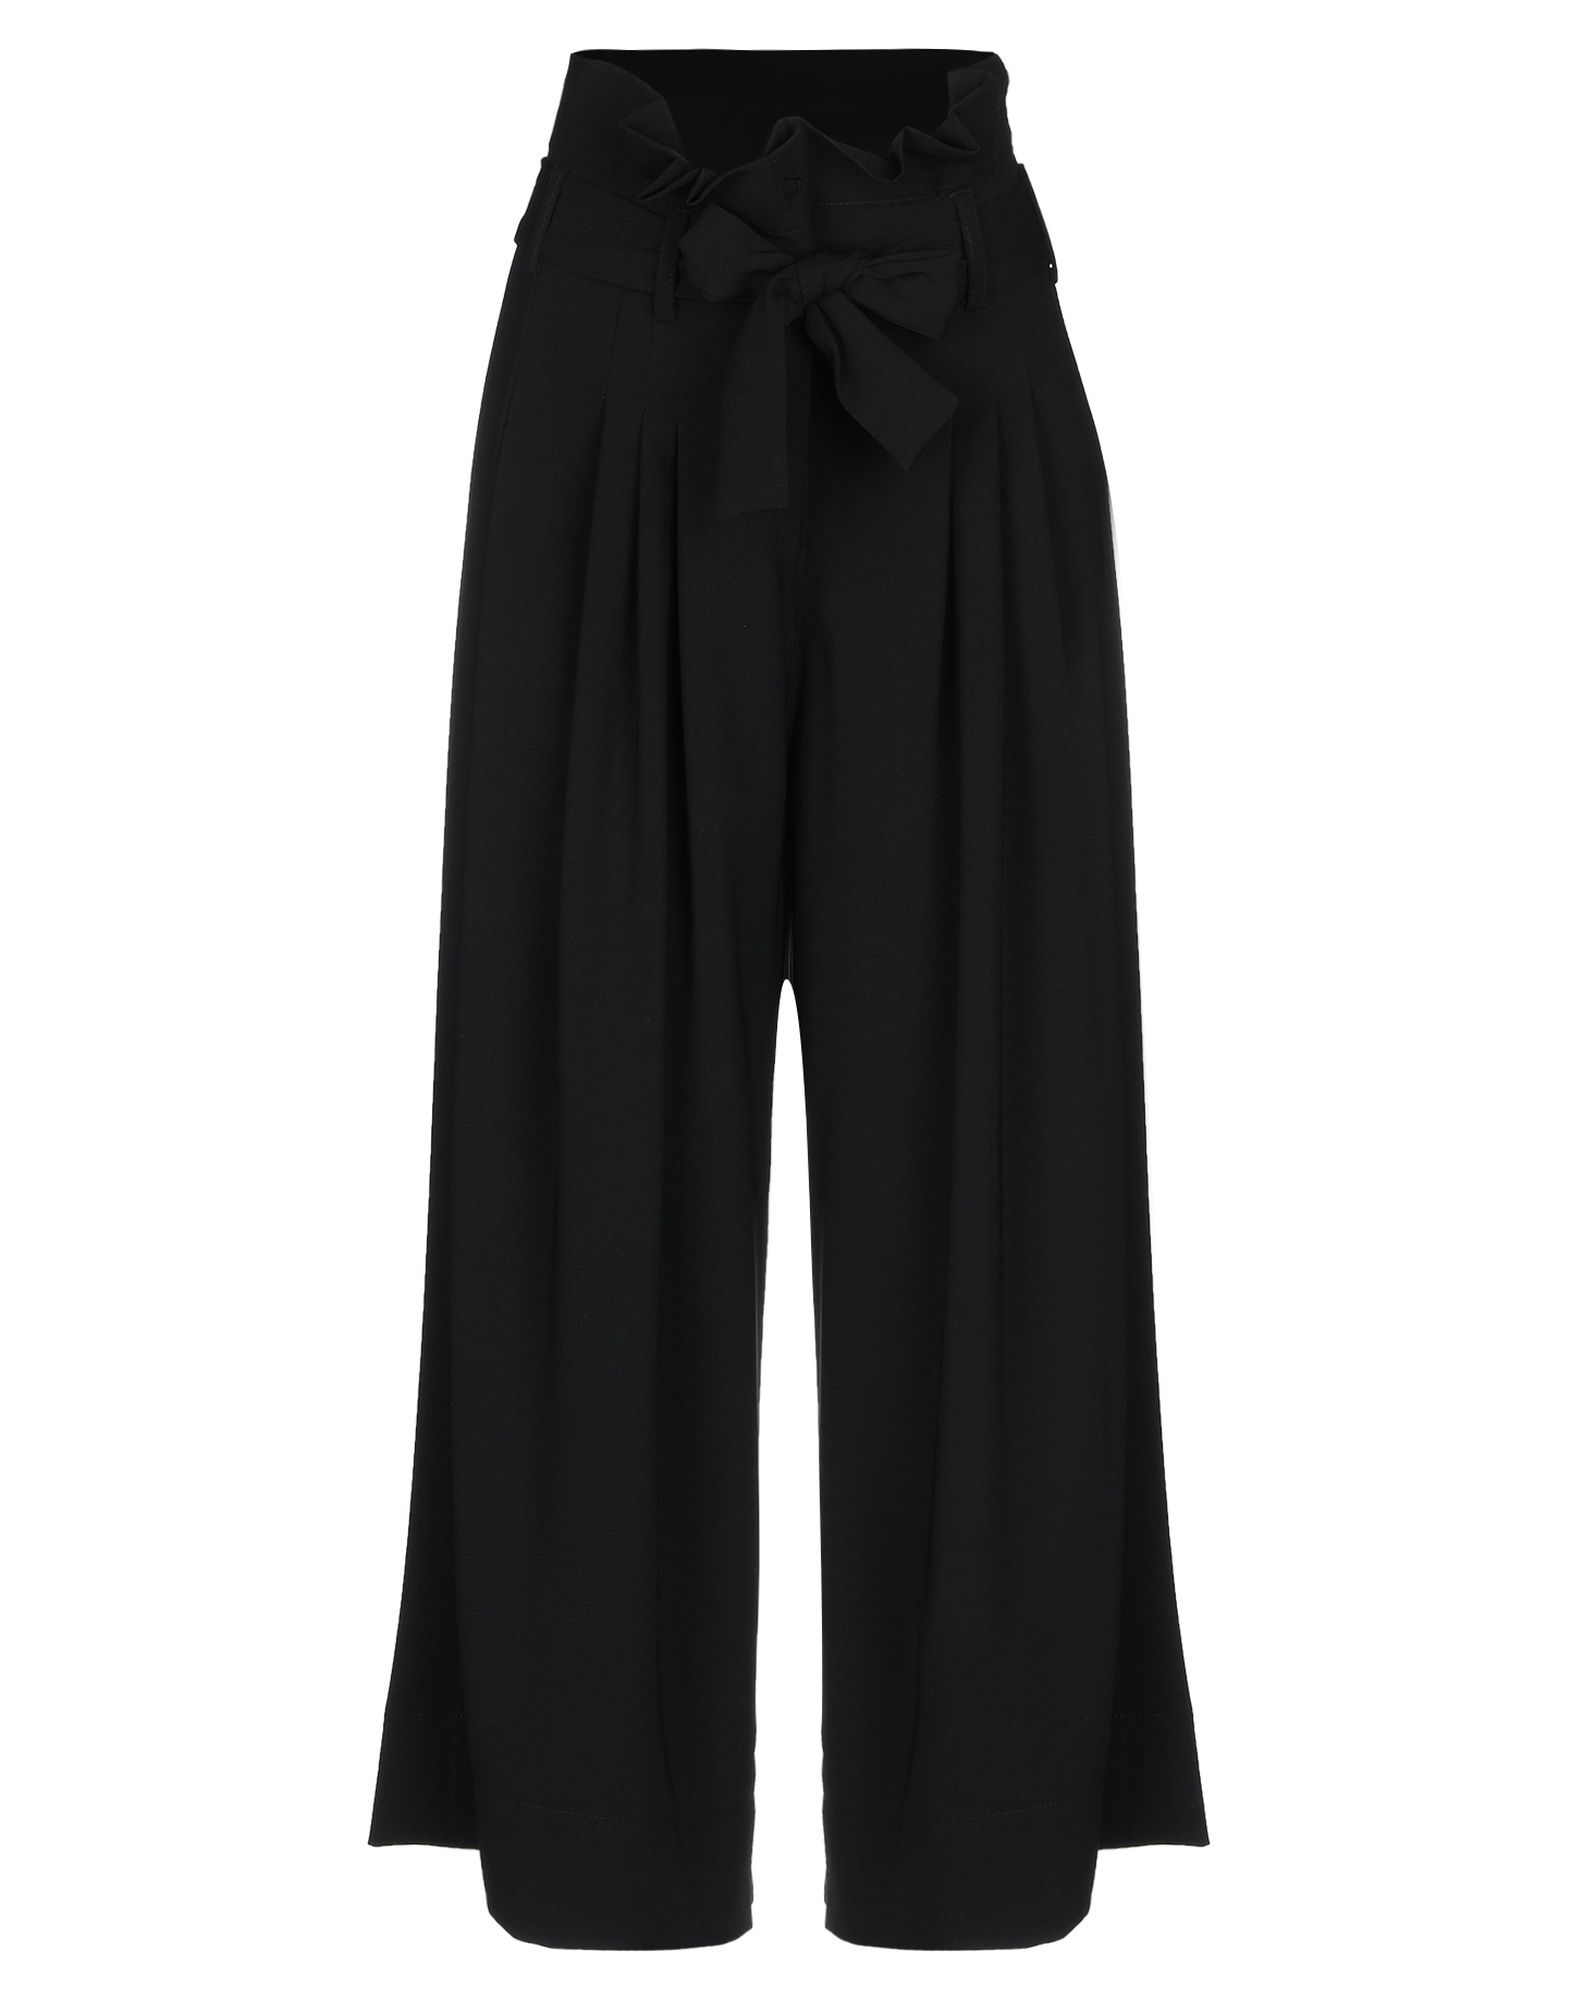 Pantalone Michela Mii Mii donna - 13339482QU  neueste Styles